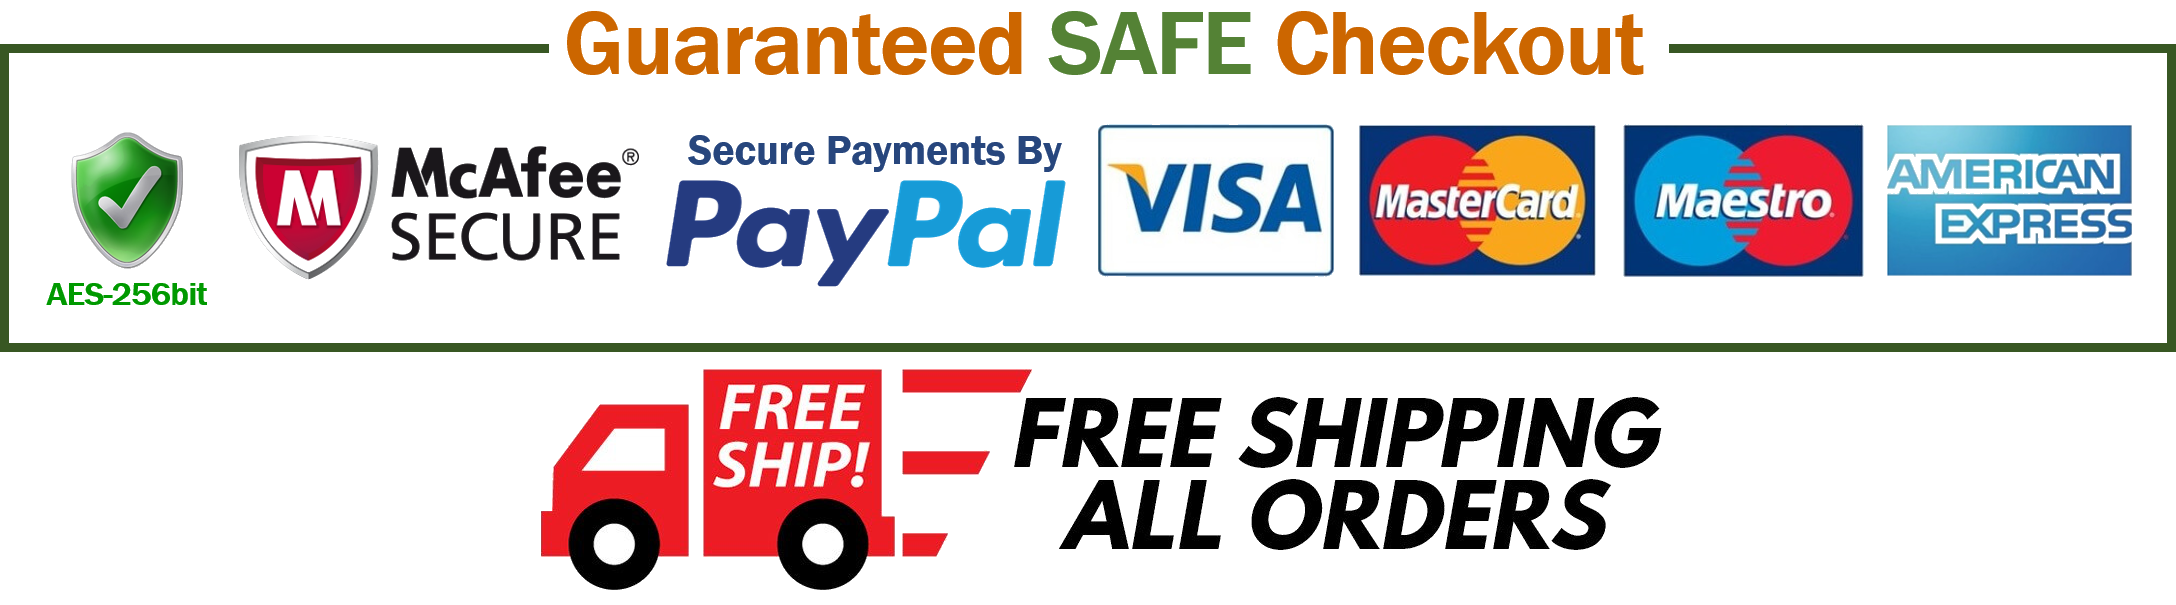 guaranteed-safe-checkout-free-shipping.png